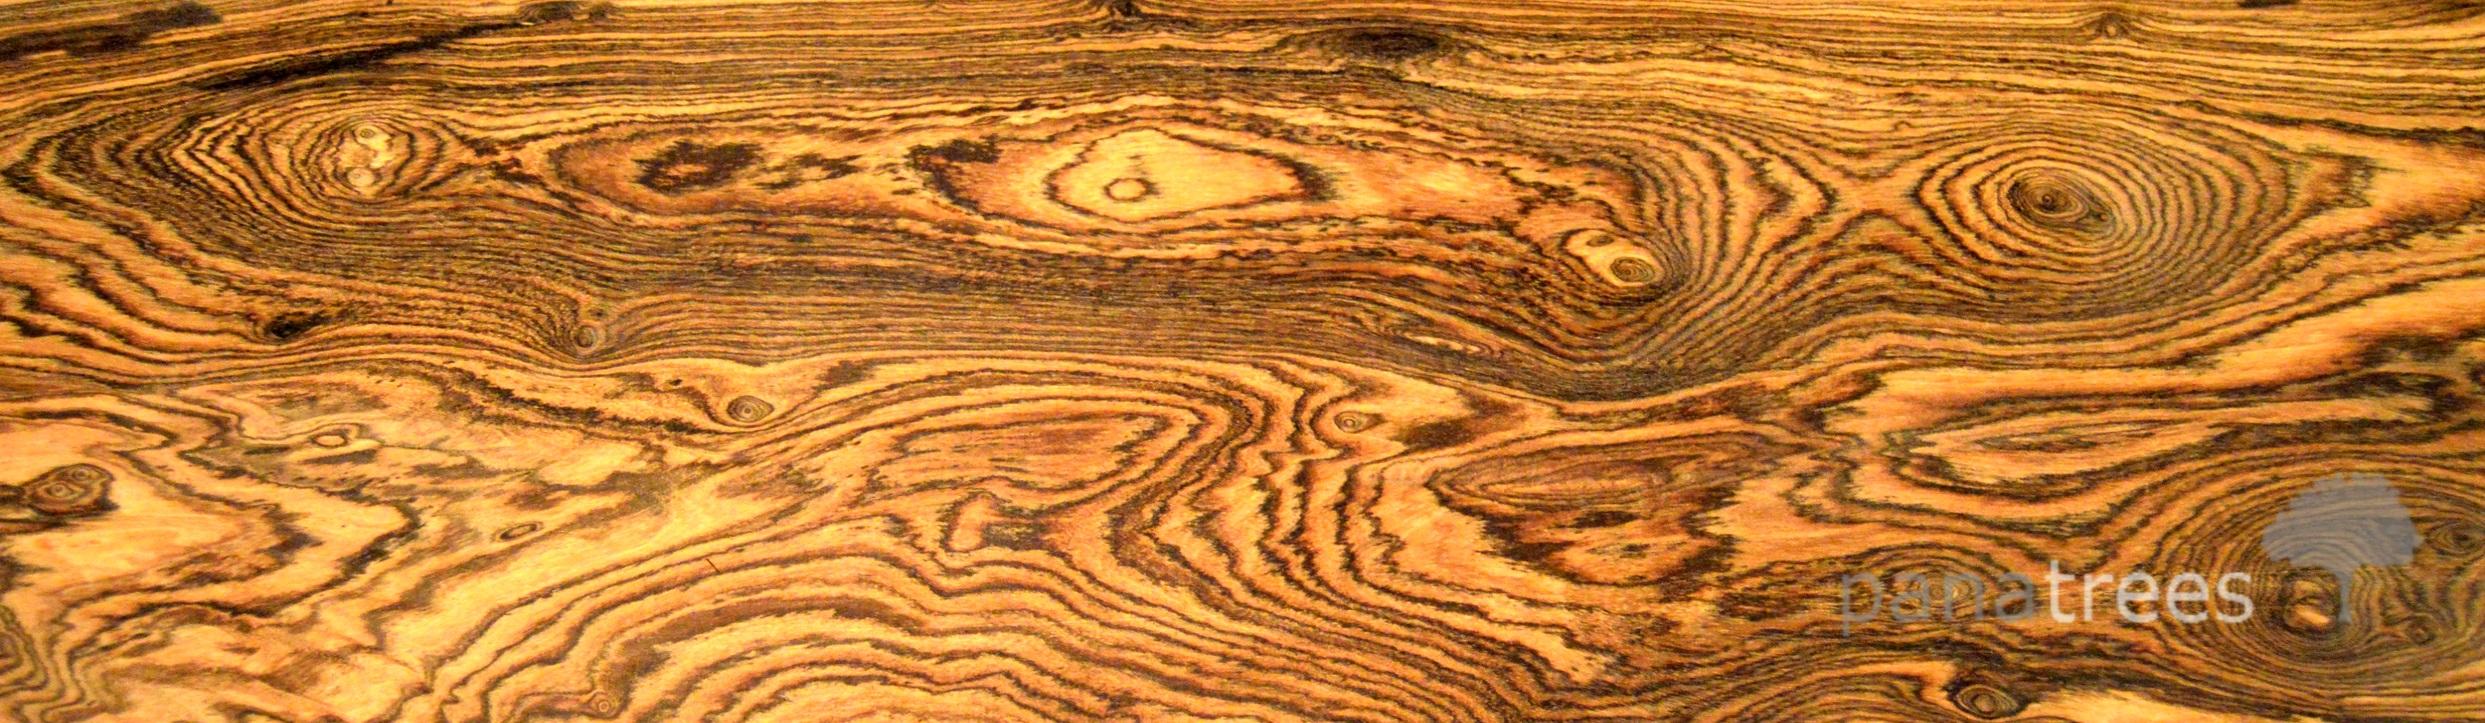 Ziricote wood texture